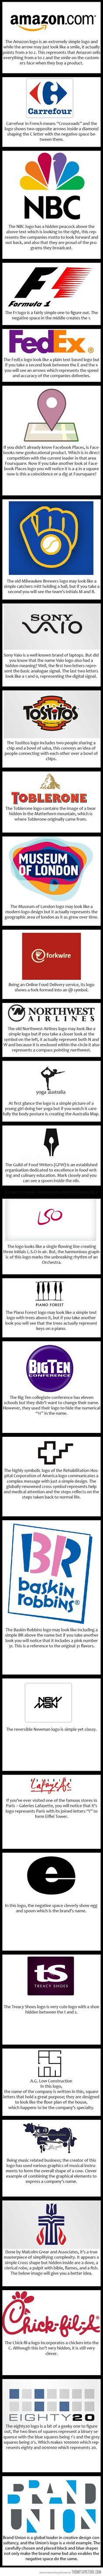 Smart Logos With Hidden Messages… amazing.